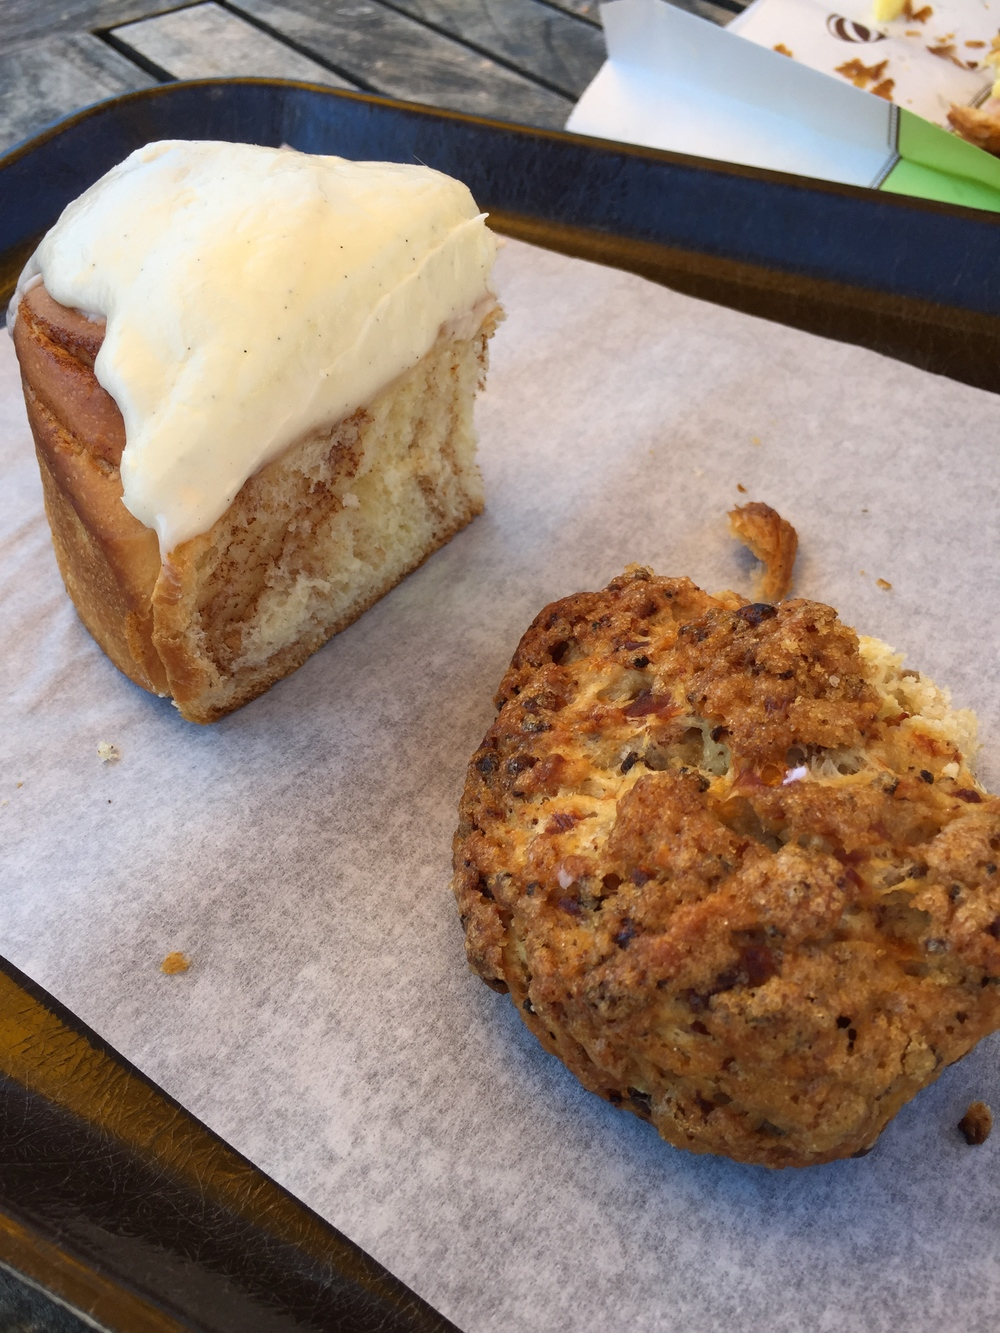 Cinnamon bun and Cheddar Scone, Bouchon Bakery